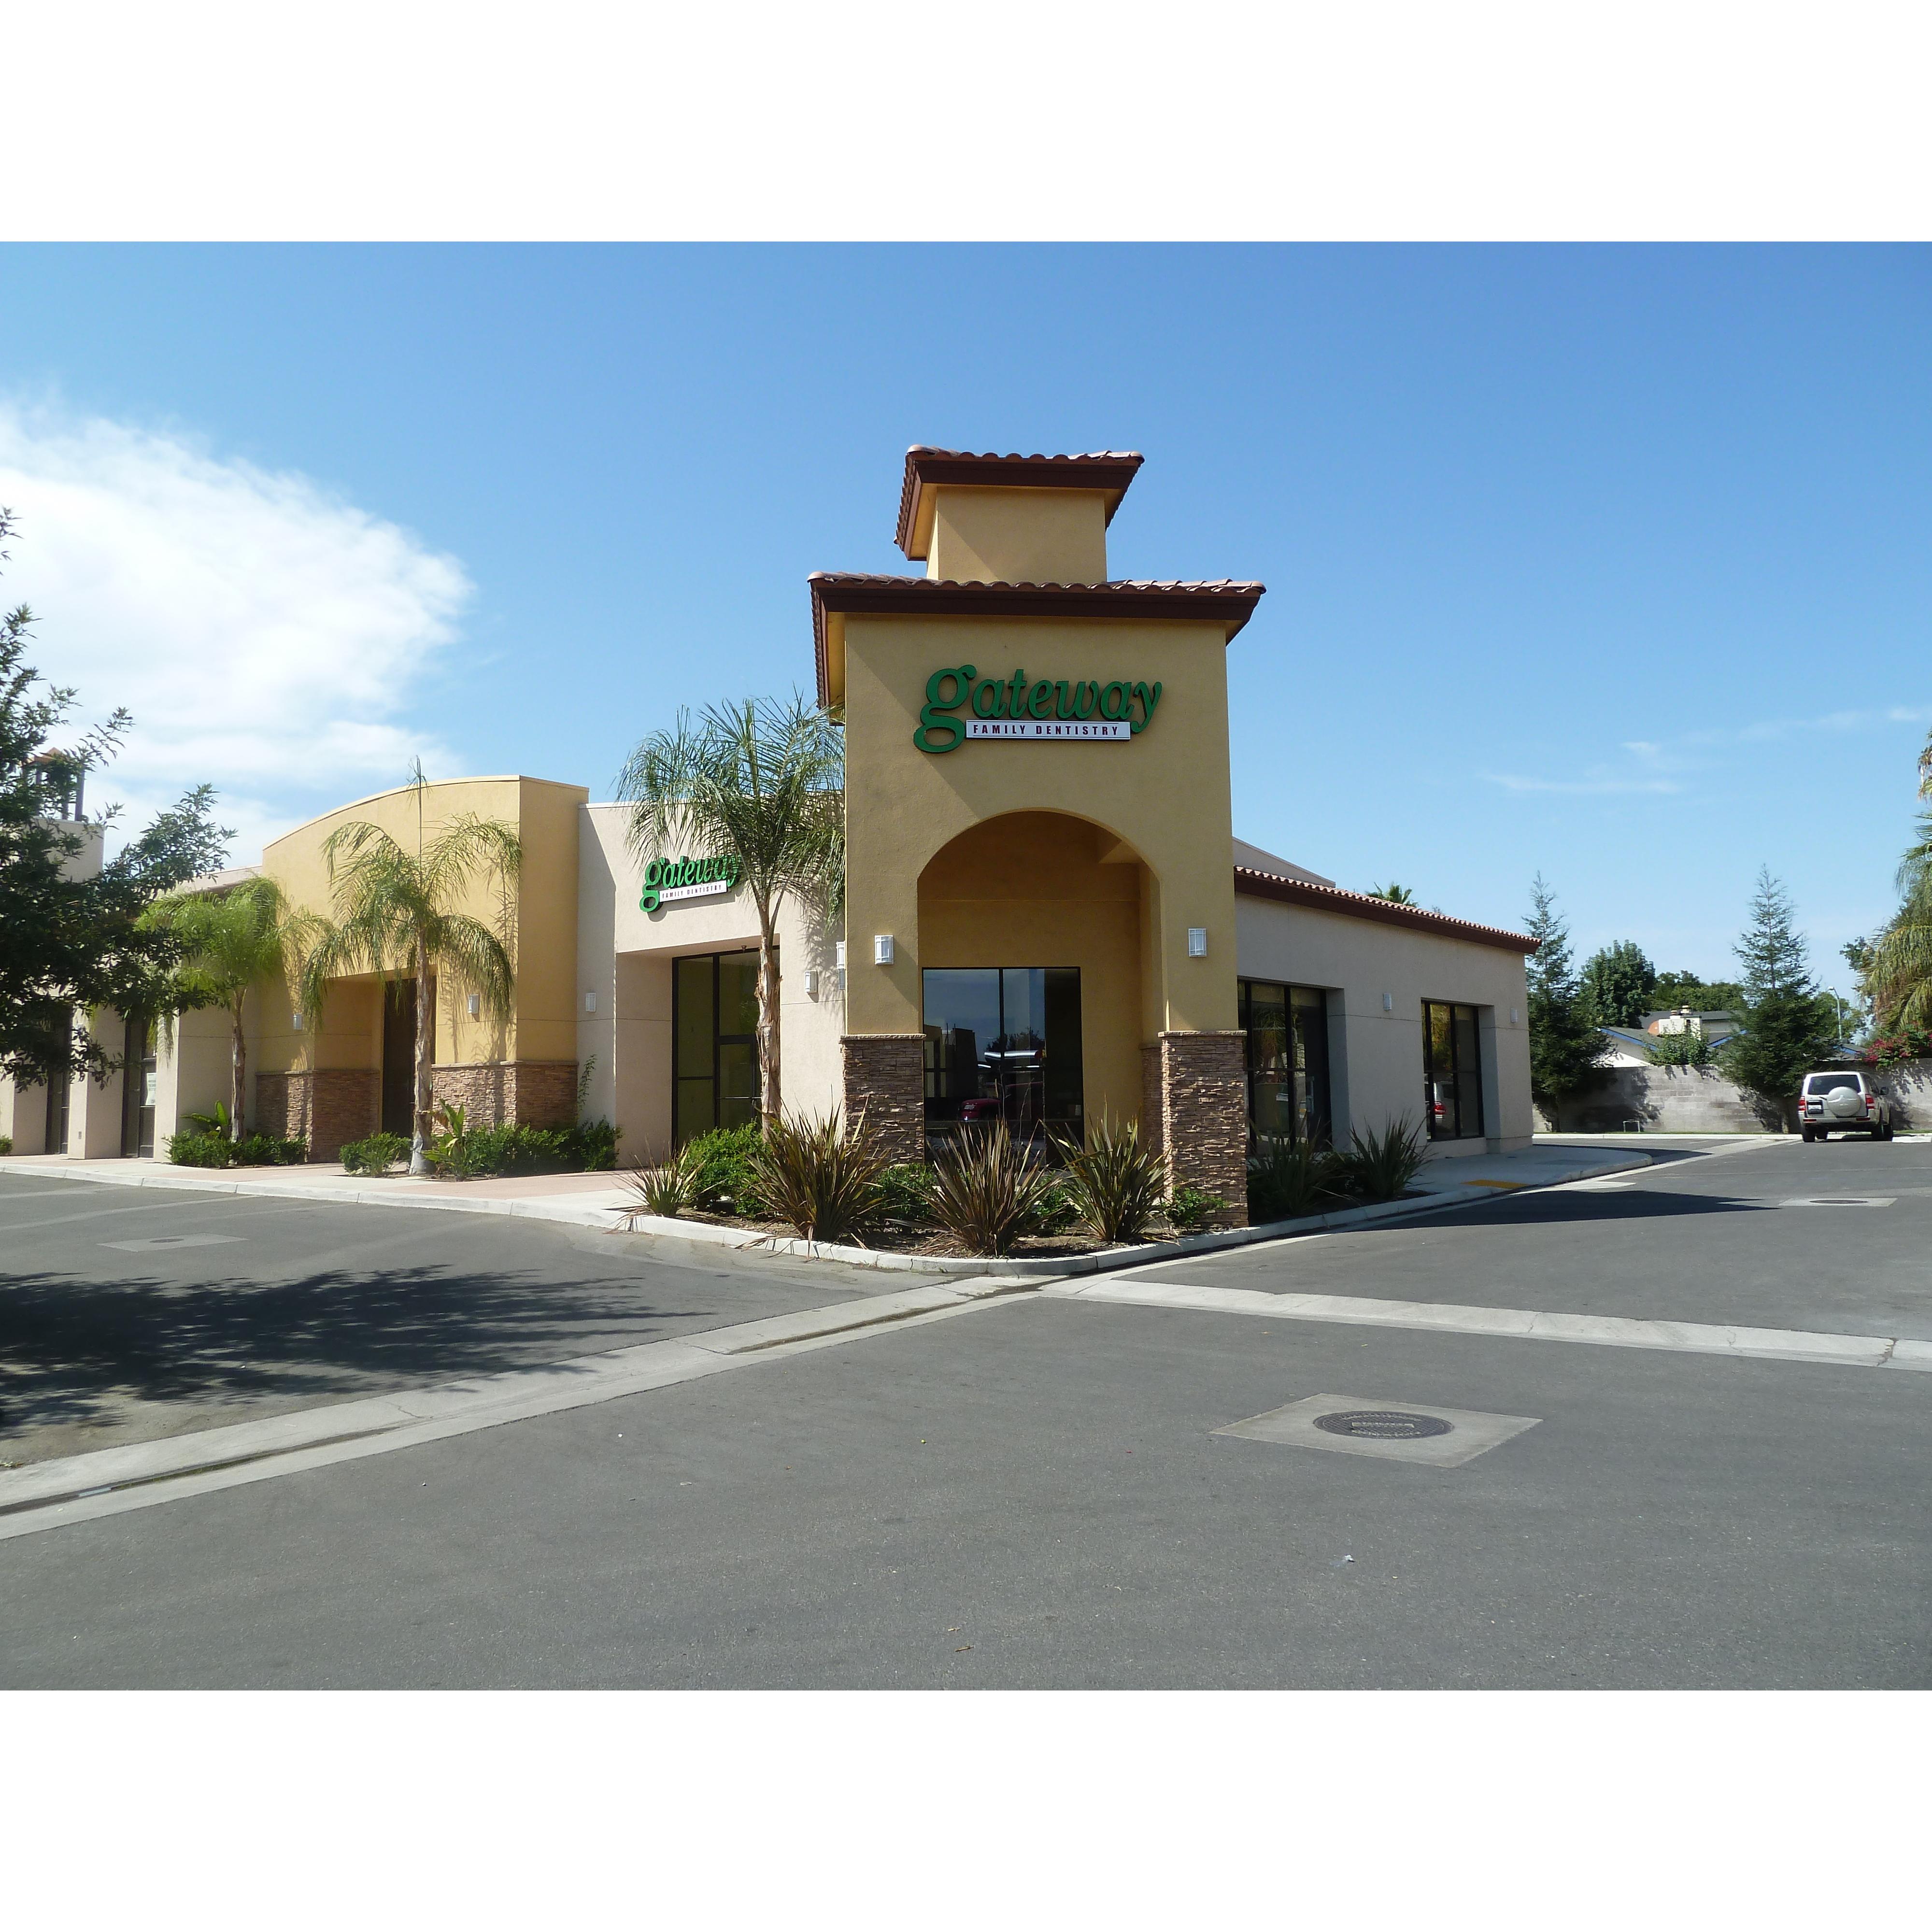 Gateway Family Dentistry - Bakersfield, CA - Dentists & Dental Services